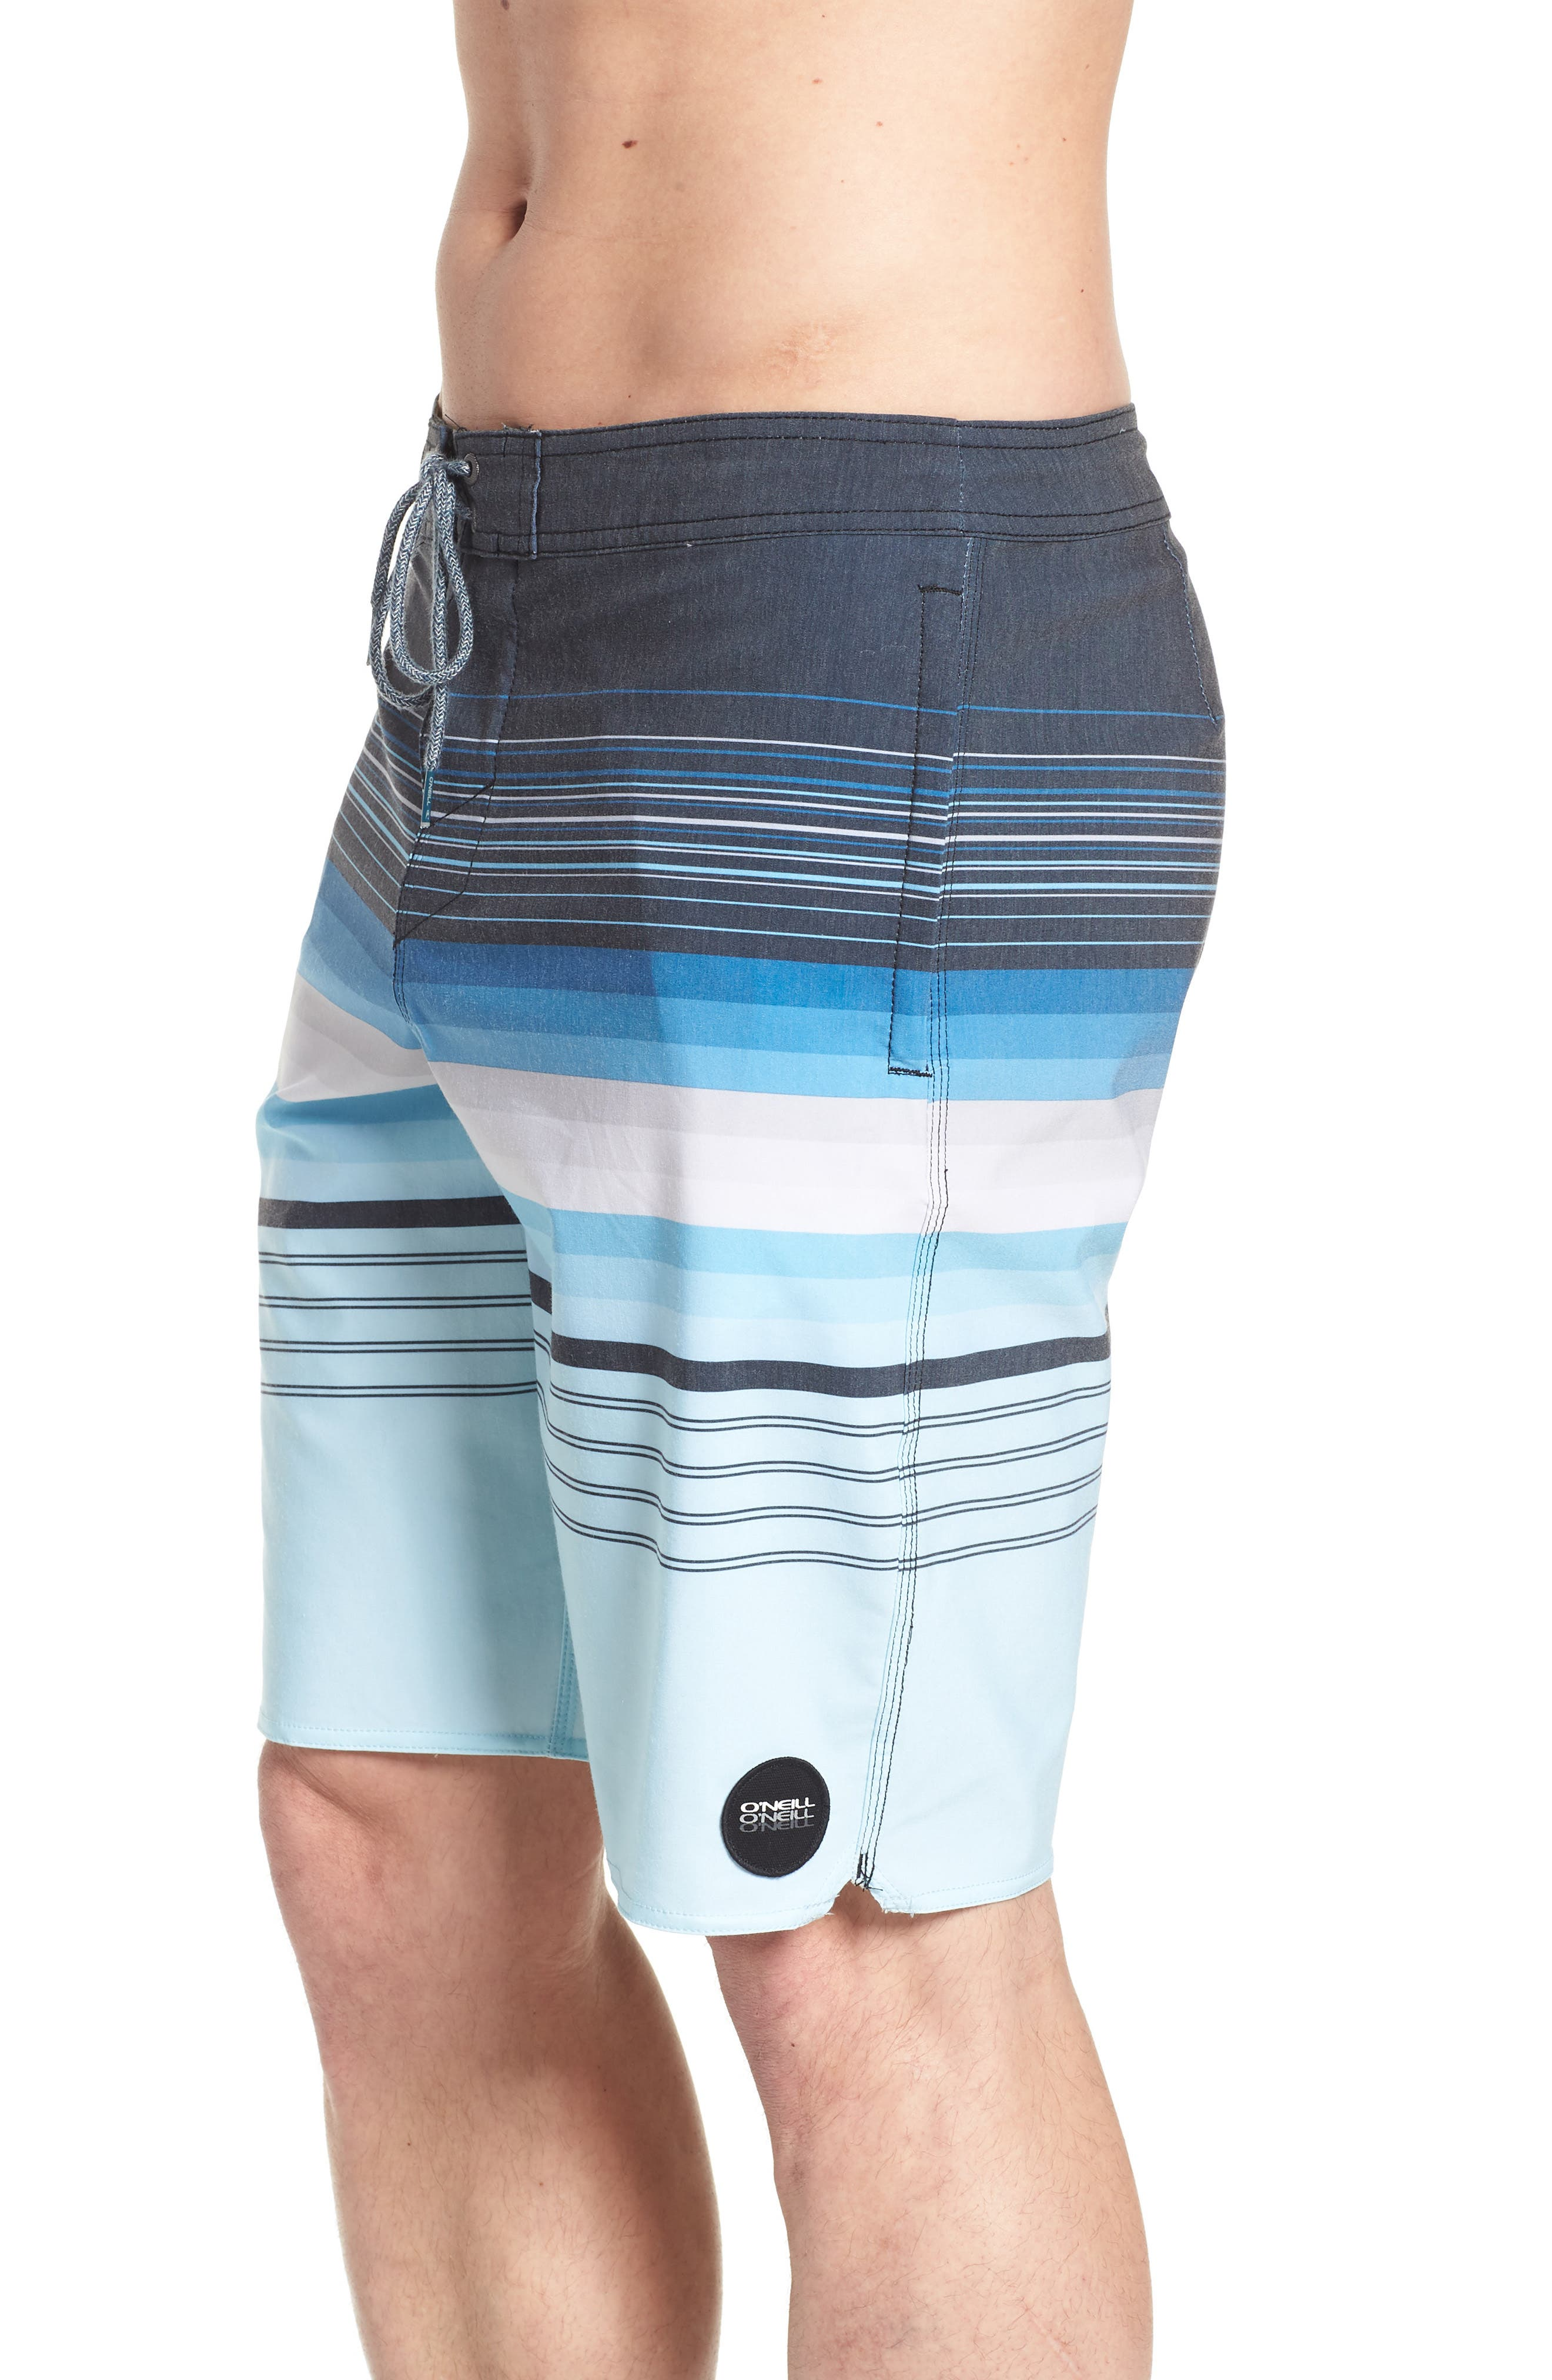 Sandbar Cruzer Board Shorts,                             Alternate thumbnail 4, color,                             NAVY